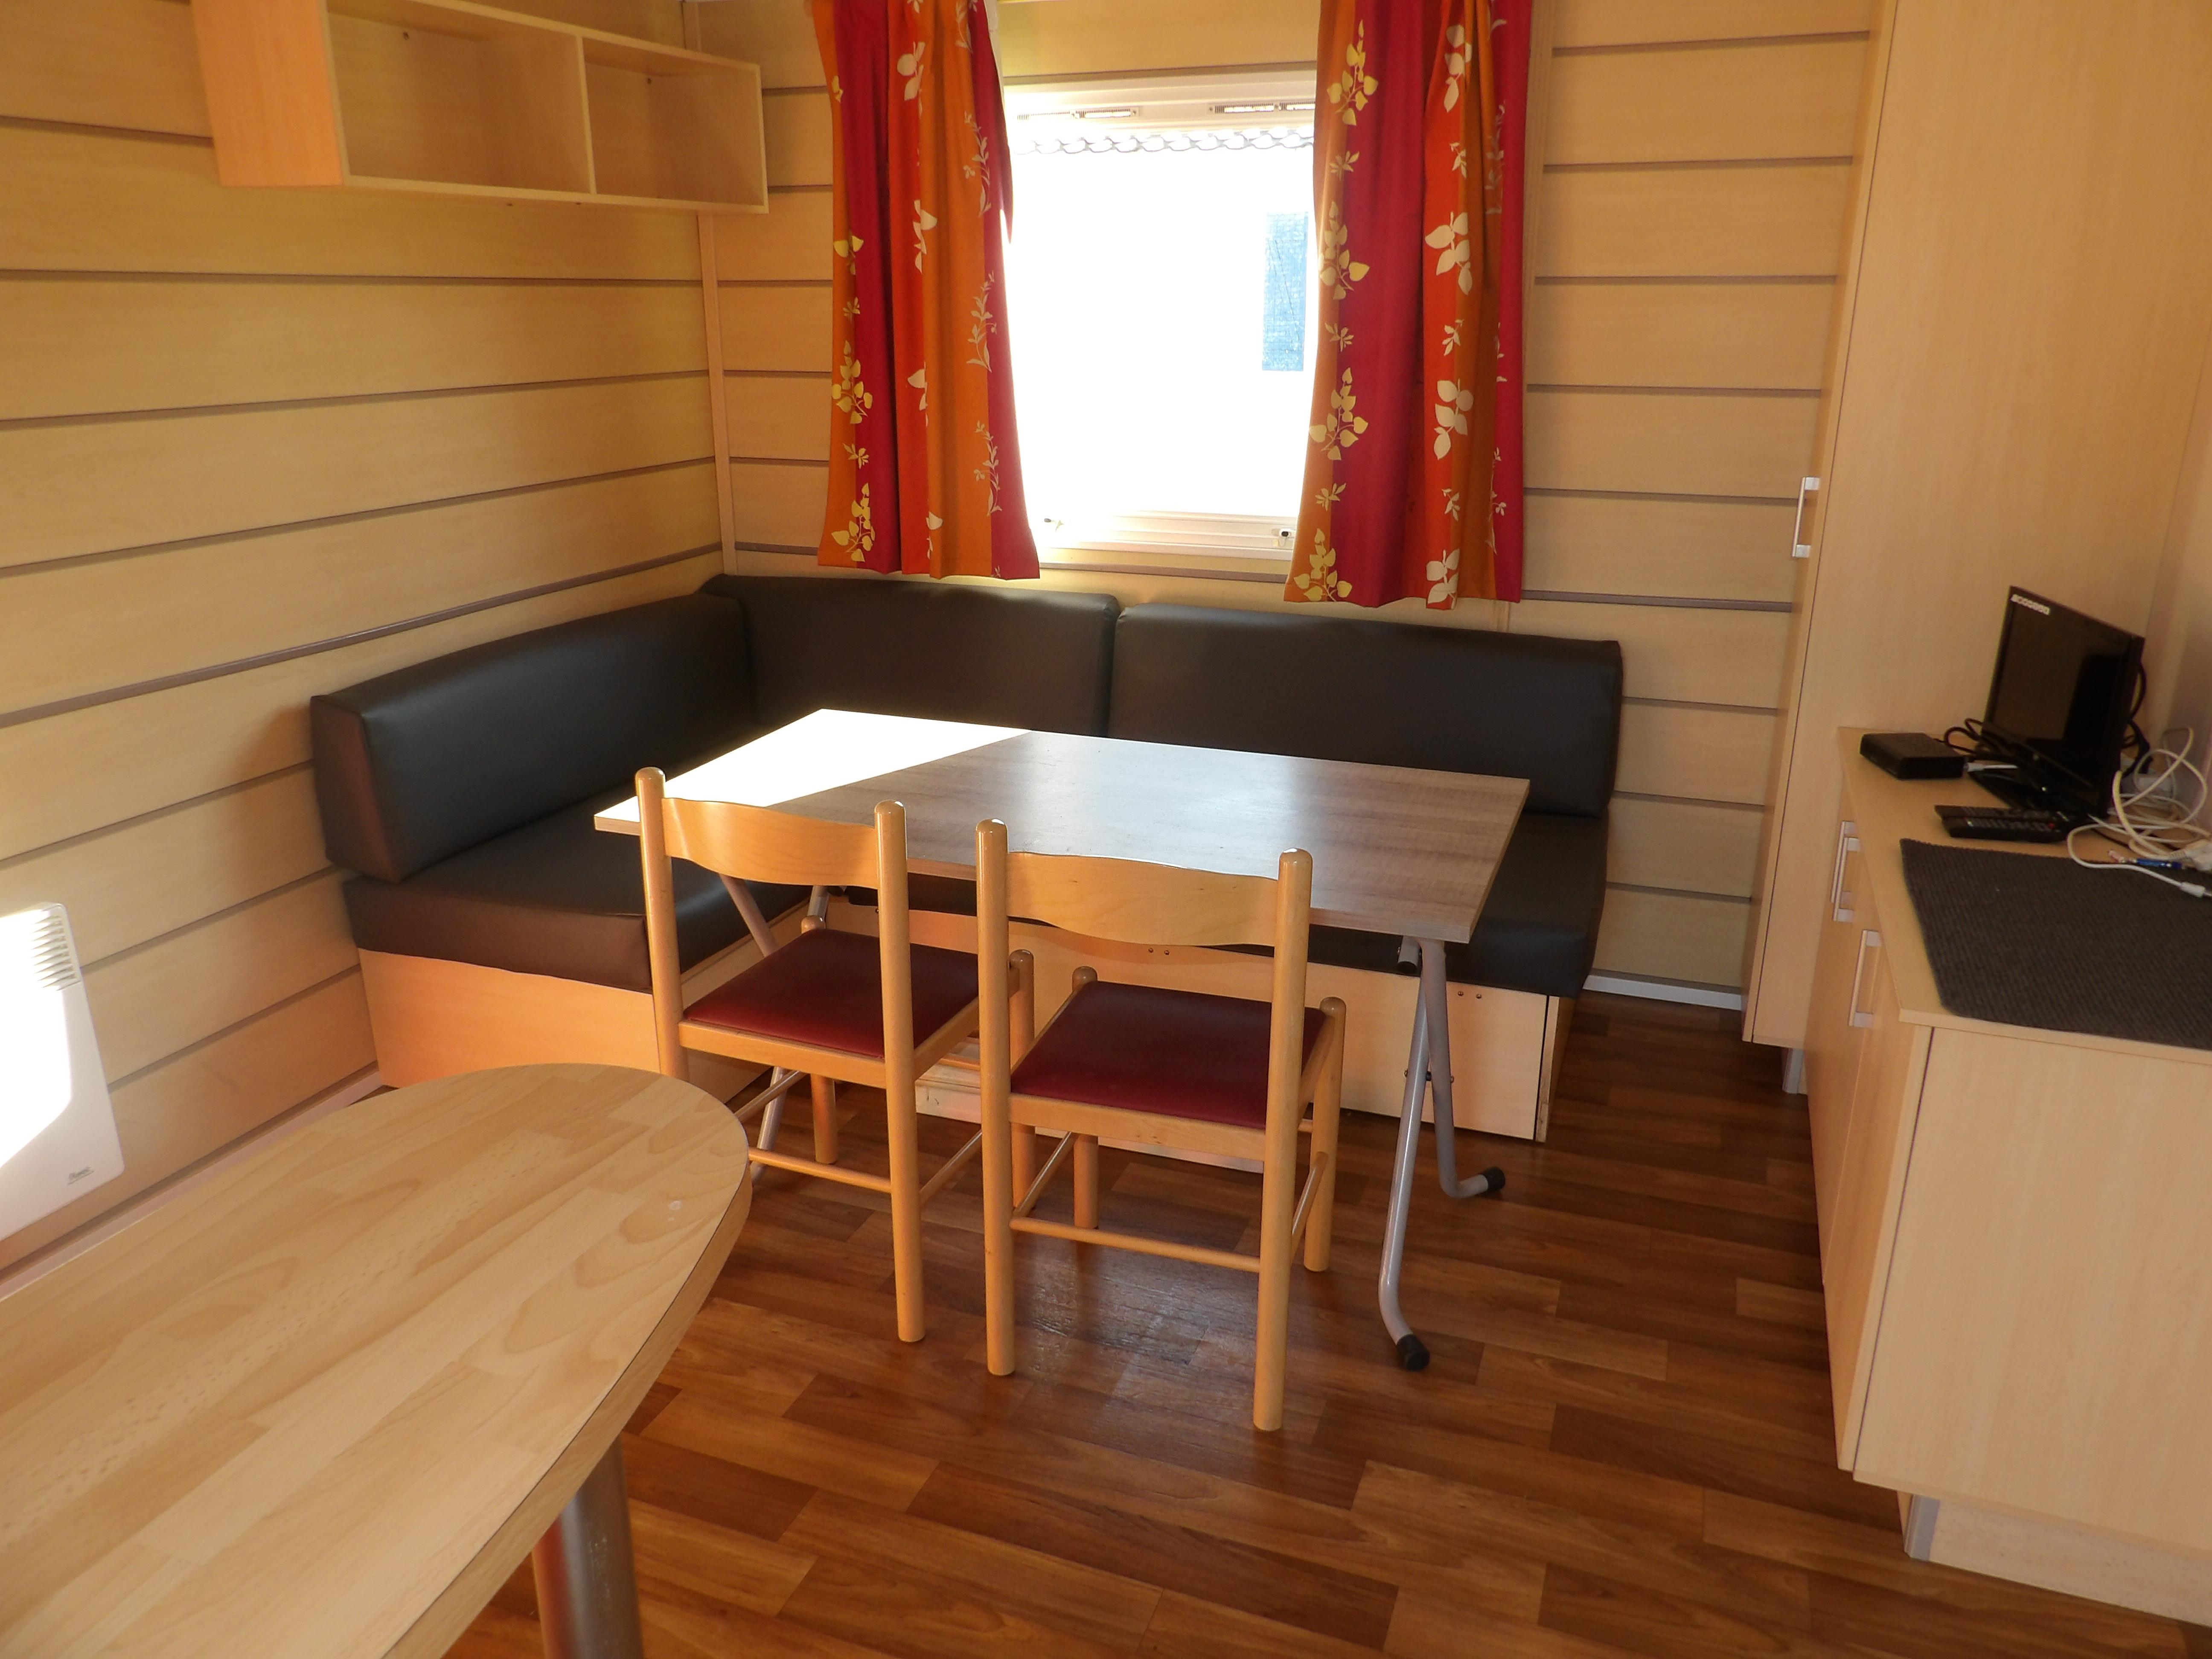 Location - Mobil-Home Confort 29M² (2 Chambres) Avec Terrasse - Côté Camping - Camping Les Étangs Mina